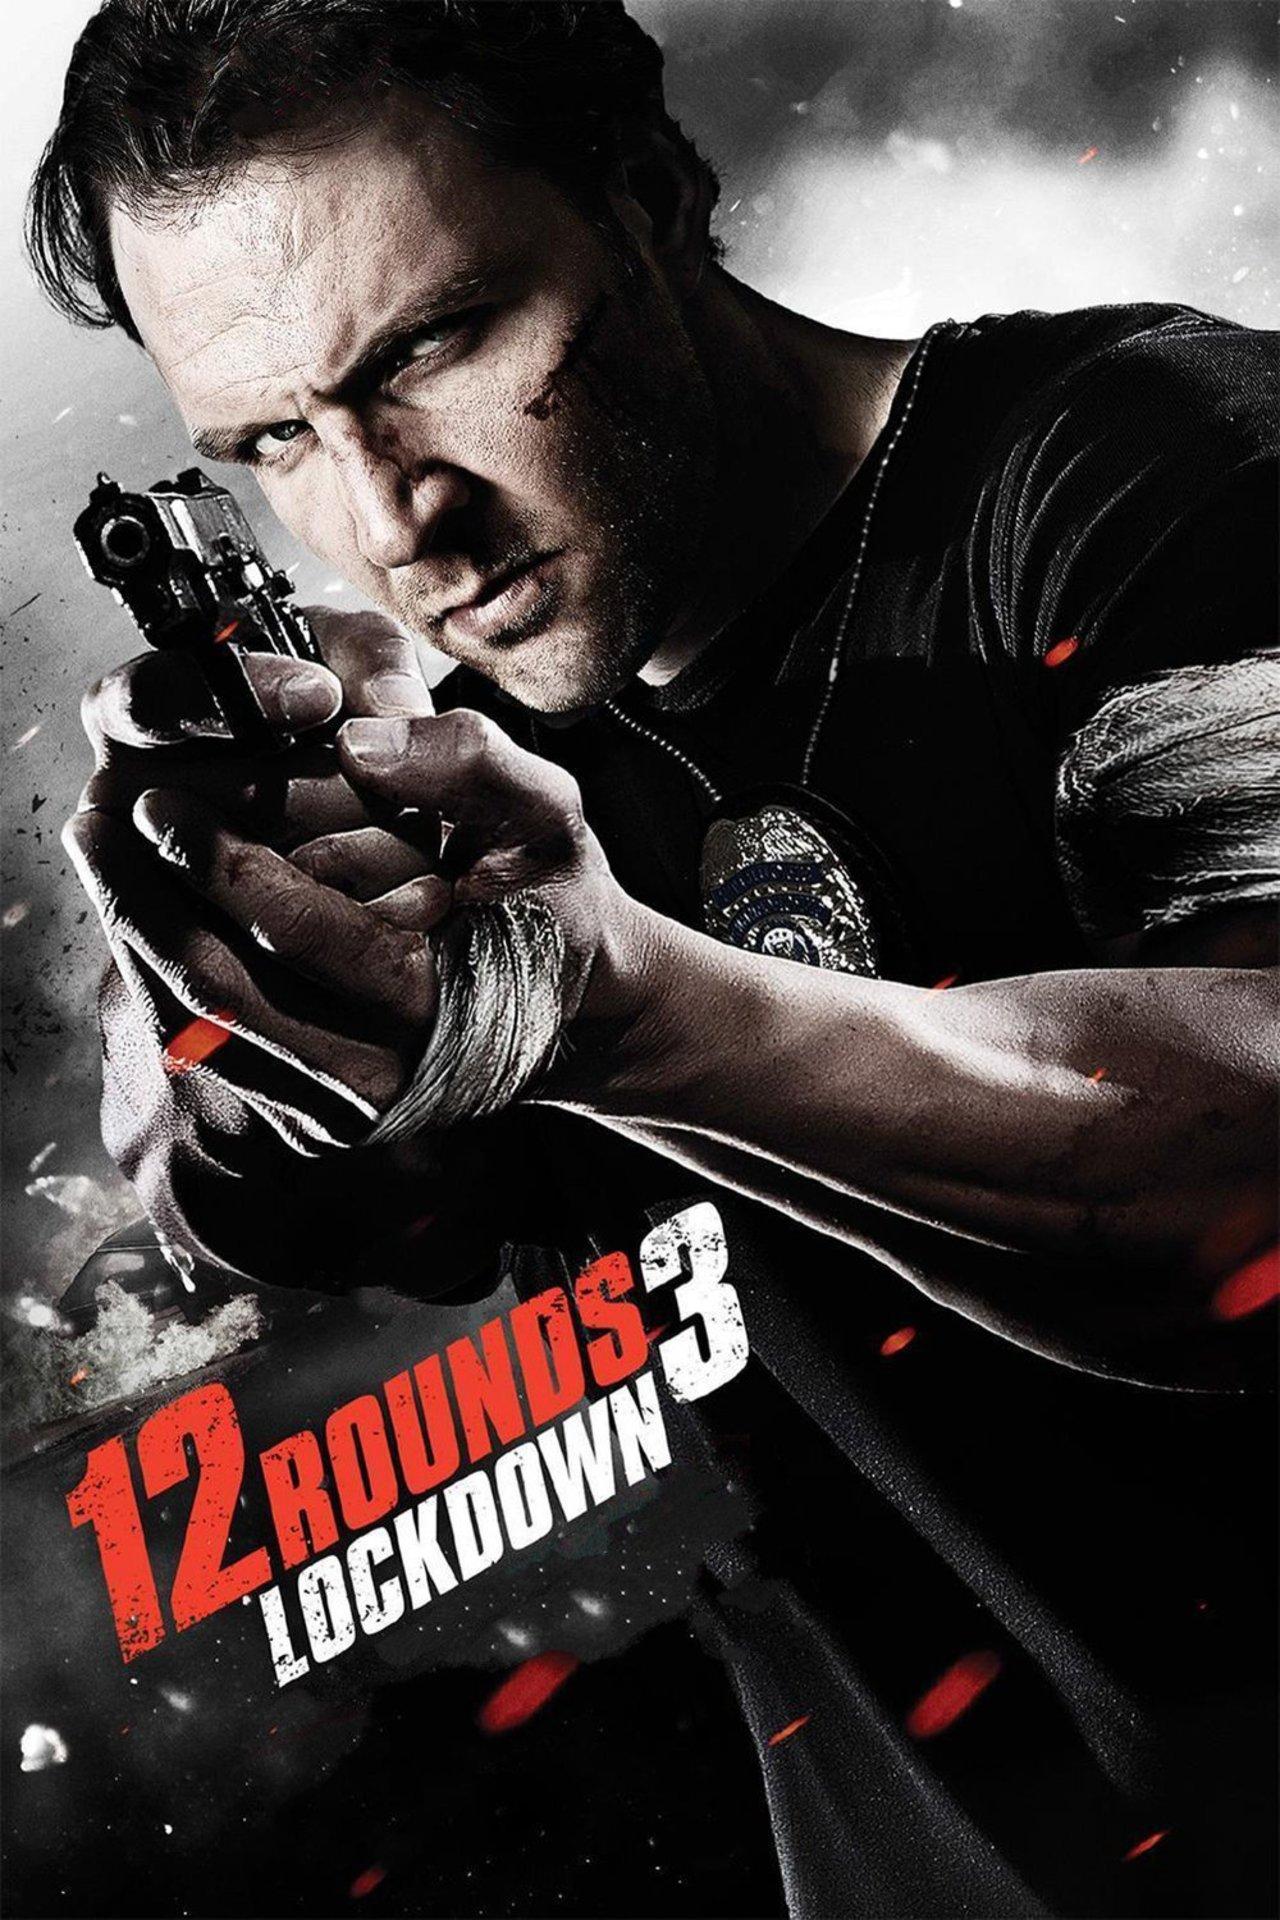 12 Rounds 3: Lockdown kapak